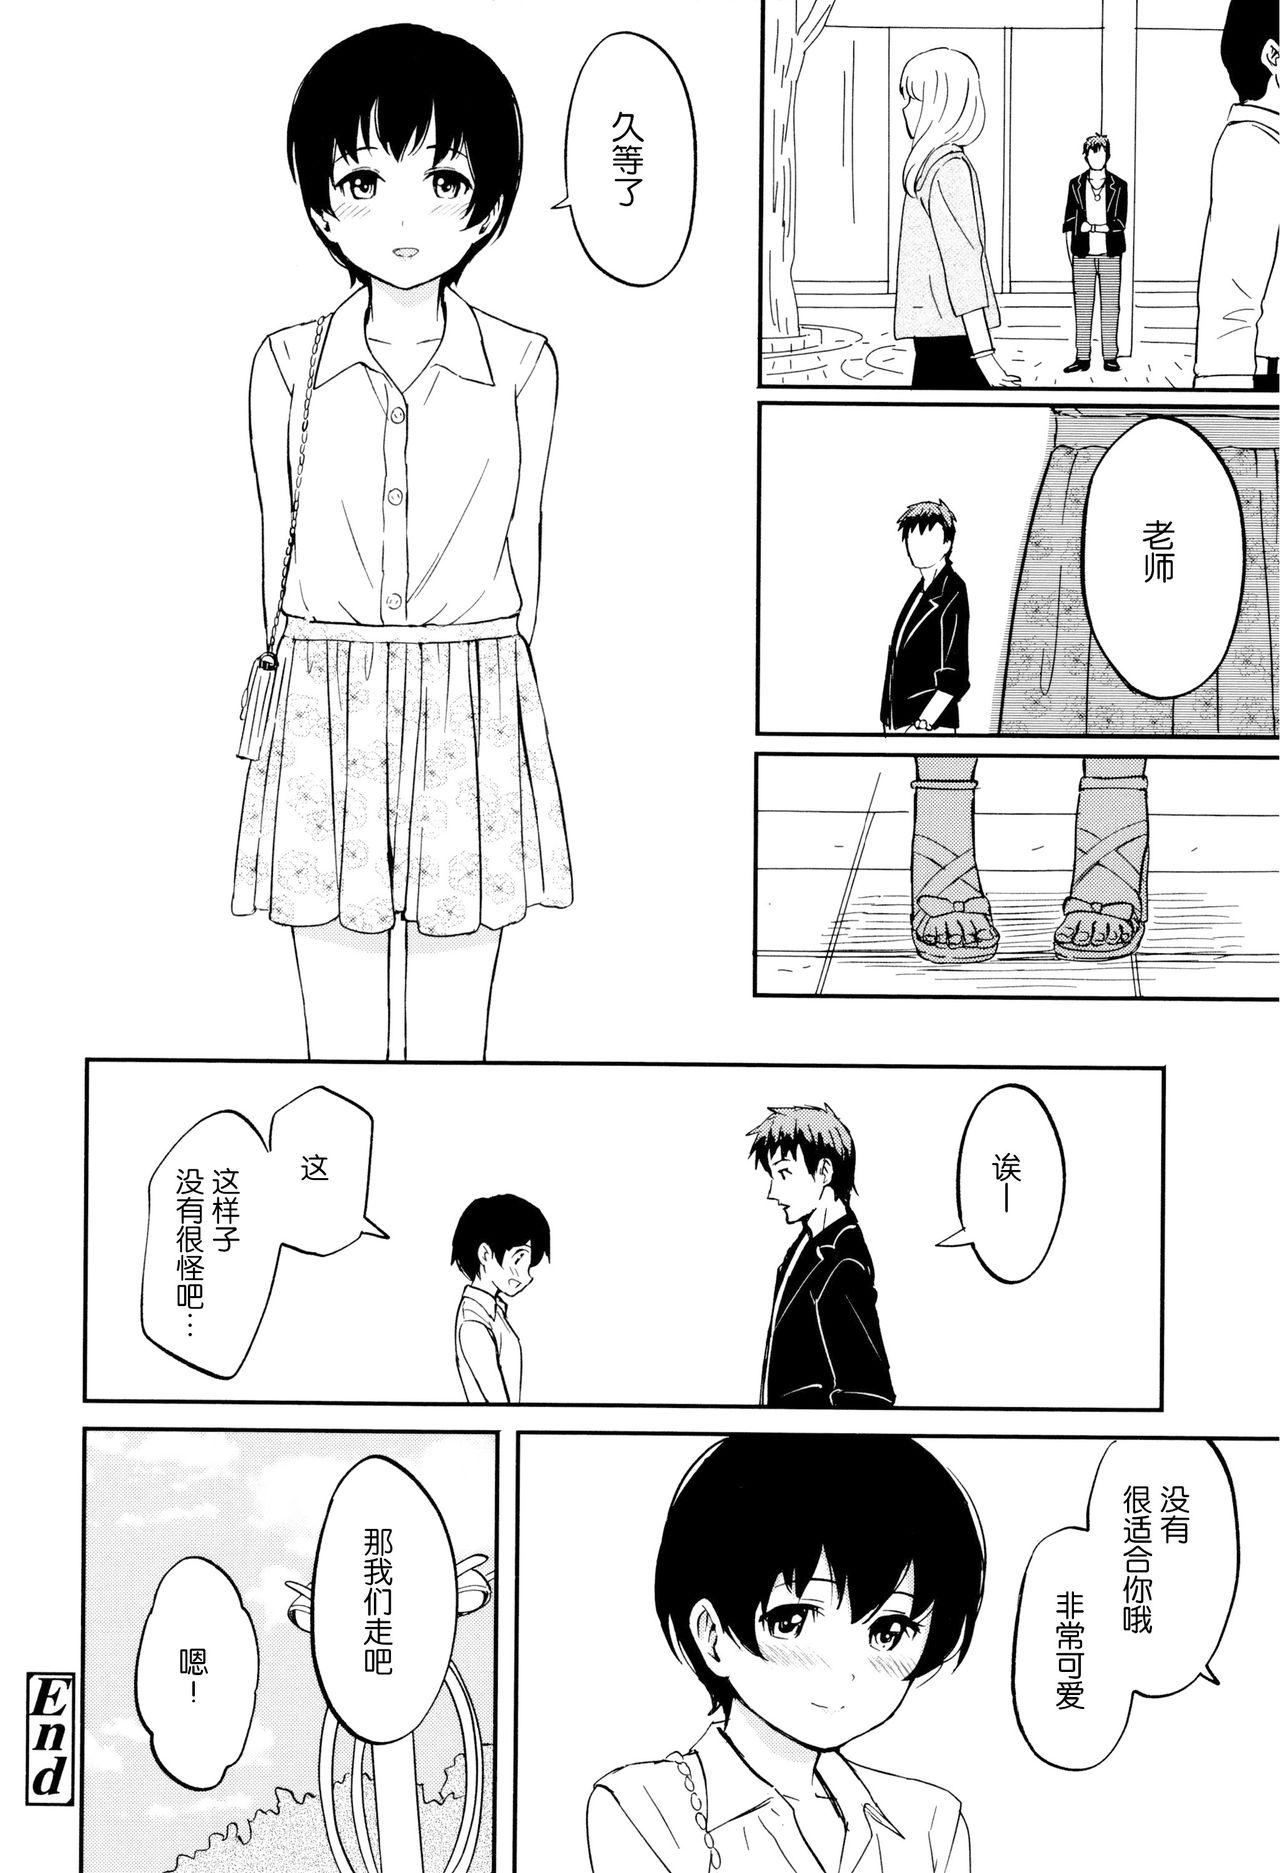 Tokubetsu na Mainichi - Special daily 142